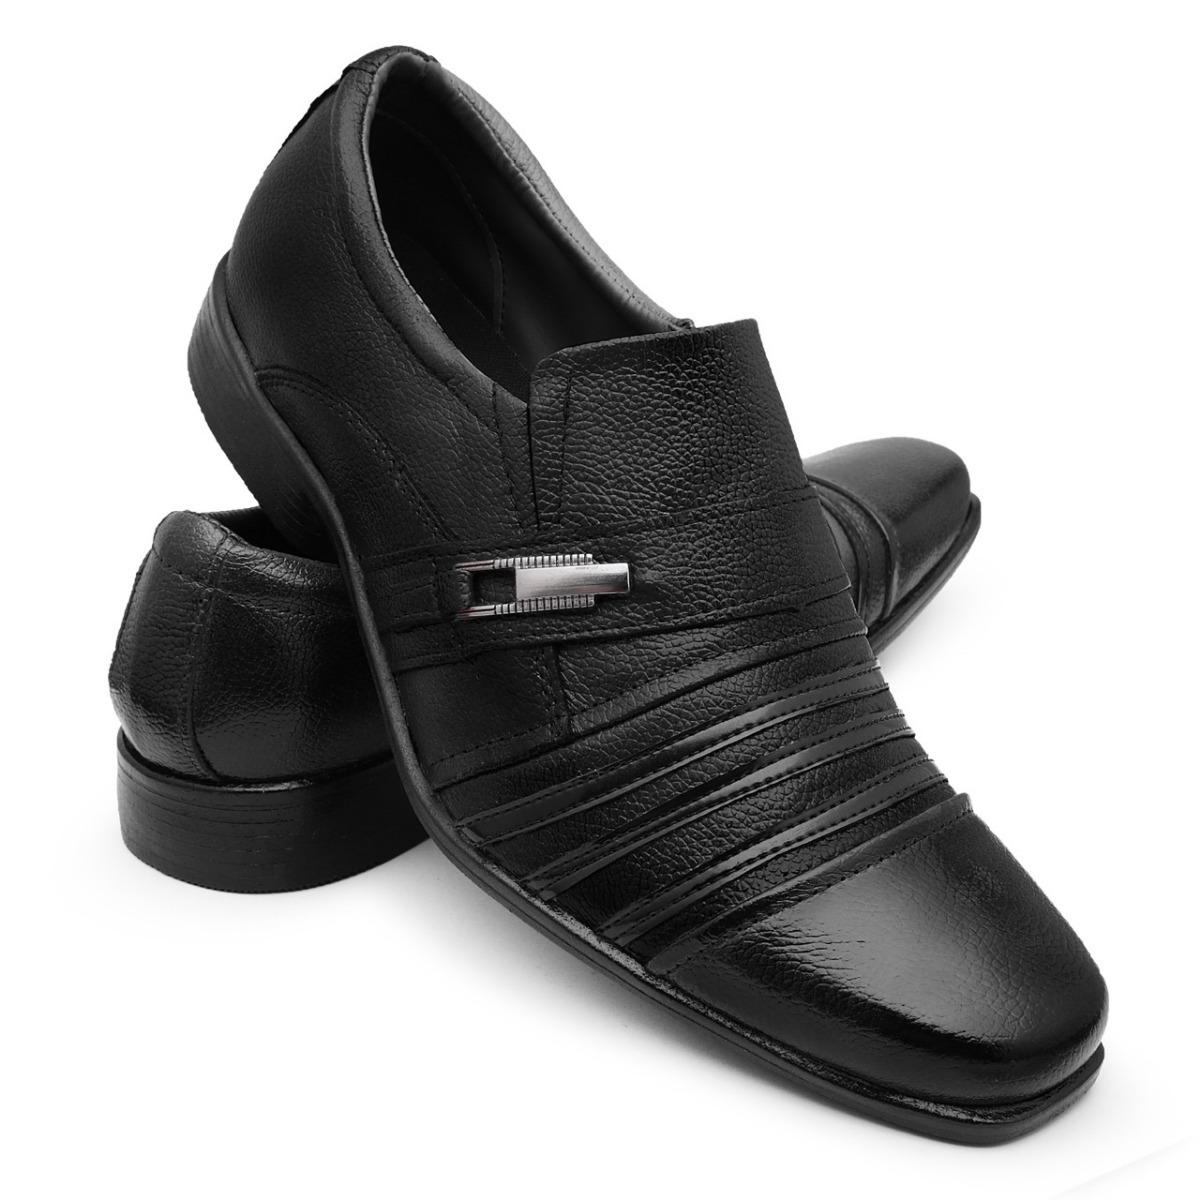 4bcc1f651c sapatênis masculino casual sapato social couro legítimo luxo. Carregando  zoom.